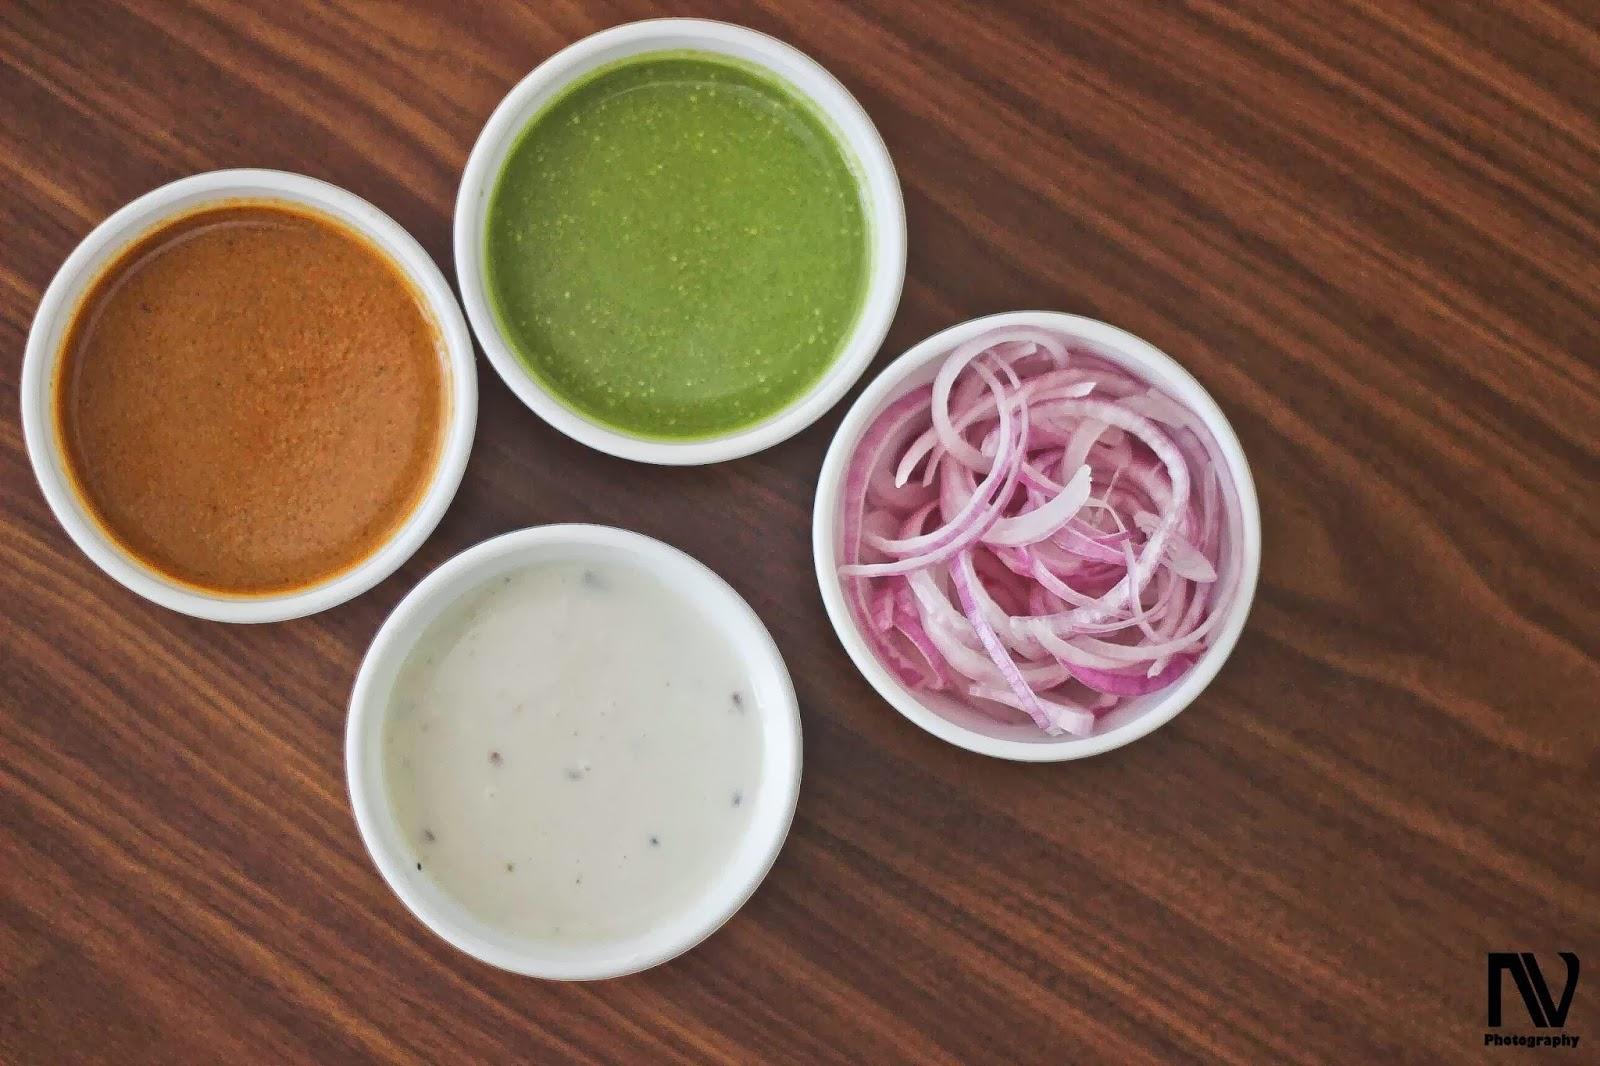 Mirchi ka Salan, Burrani Raita, Hari Chutney and Onions